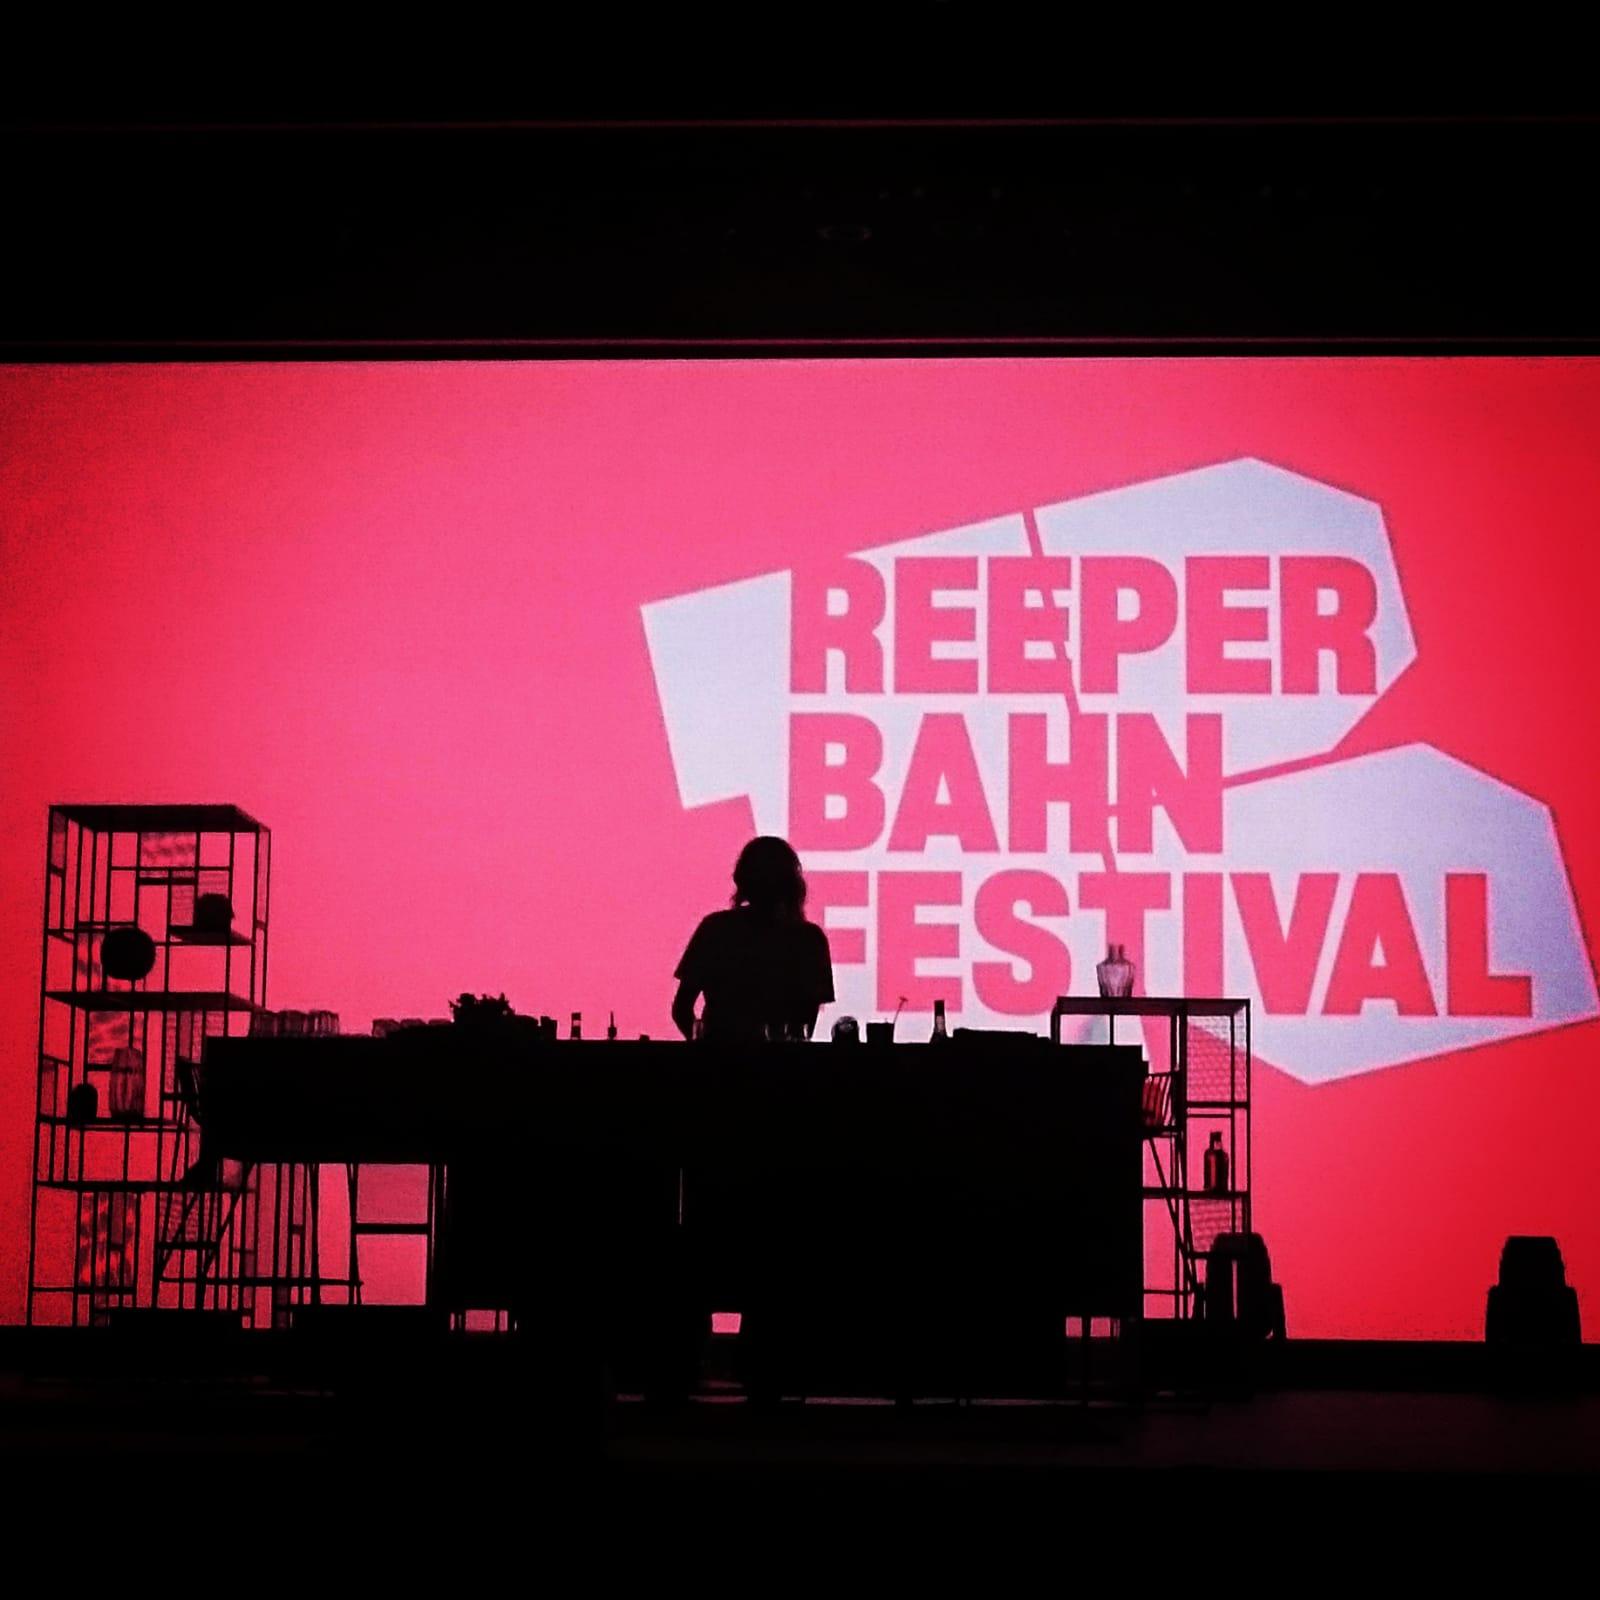 Doors Open, Reeperbahn Festival, Operettenhaus, St. Pauli